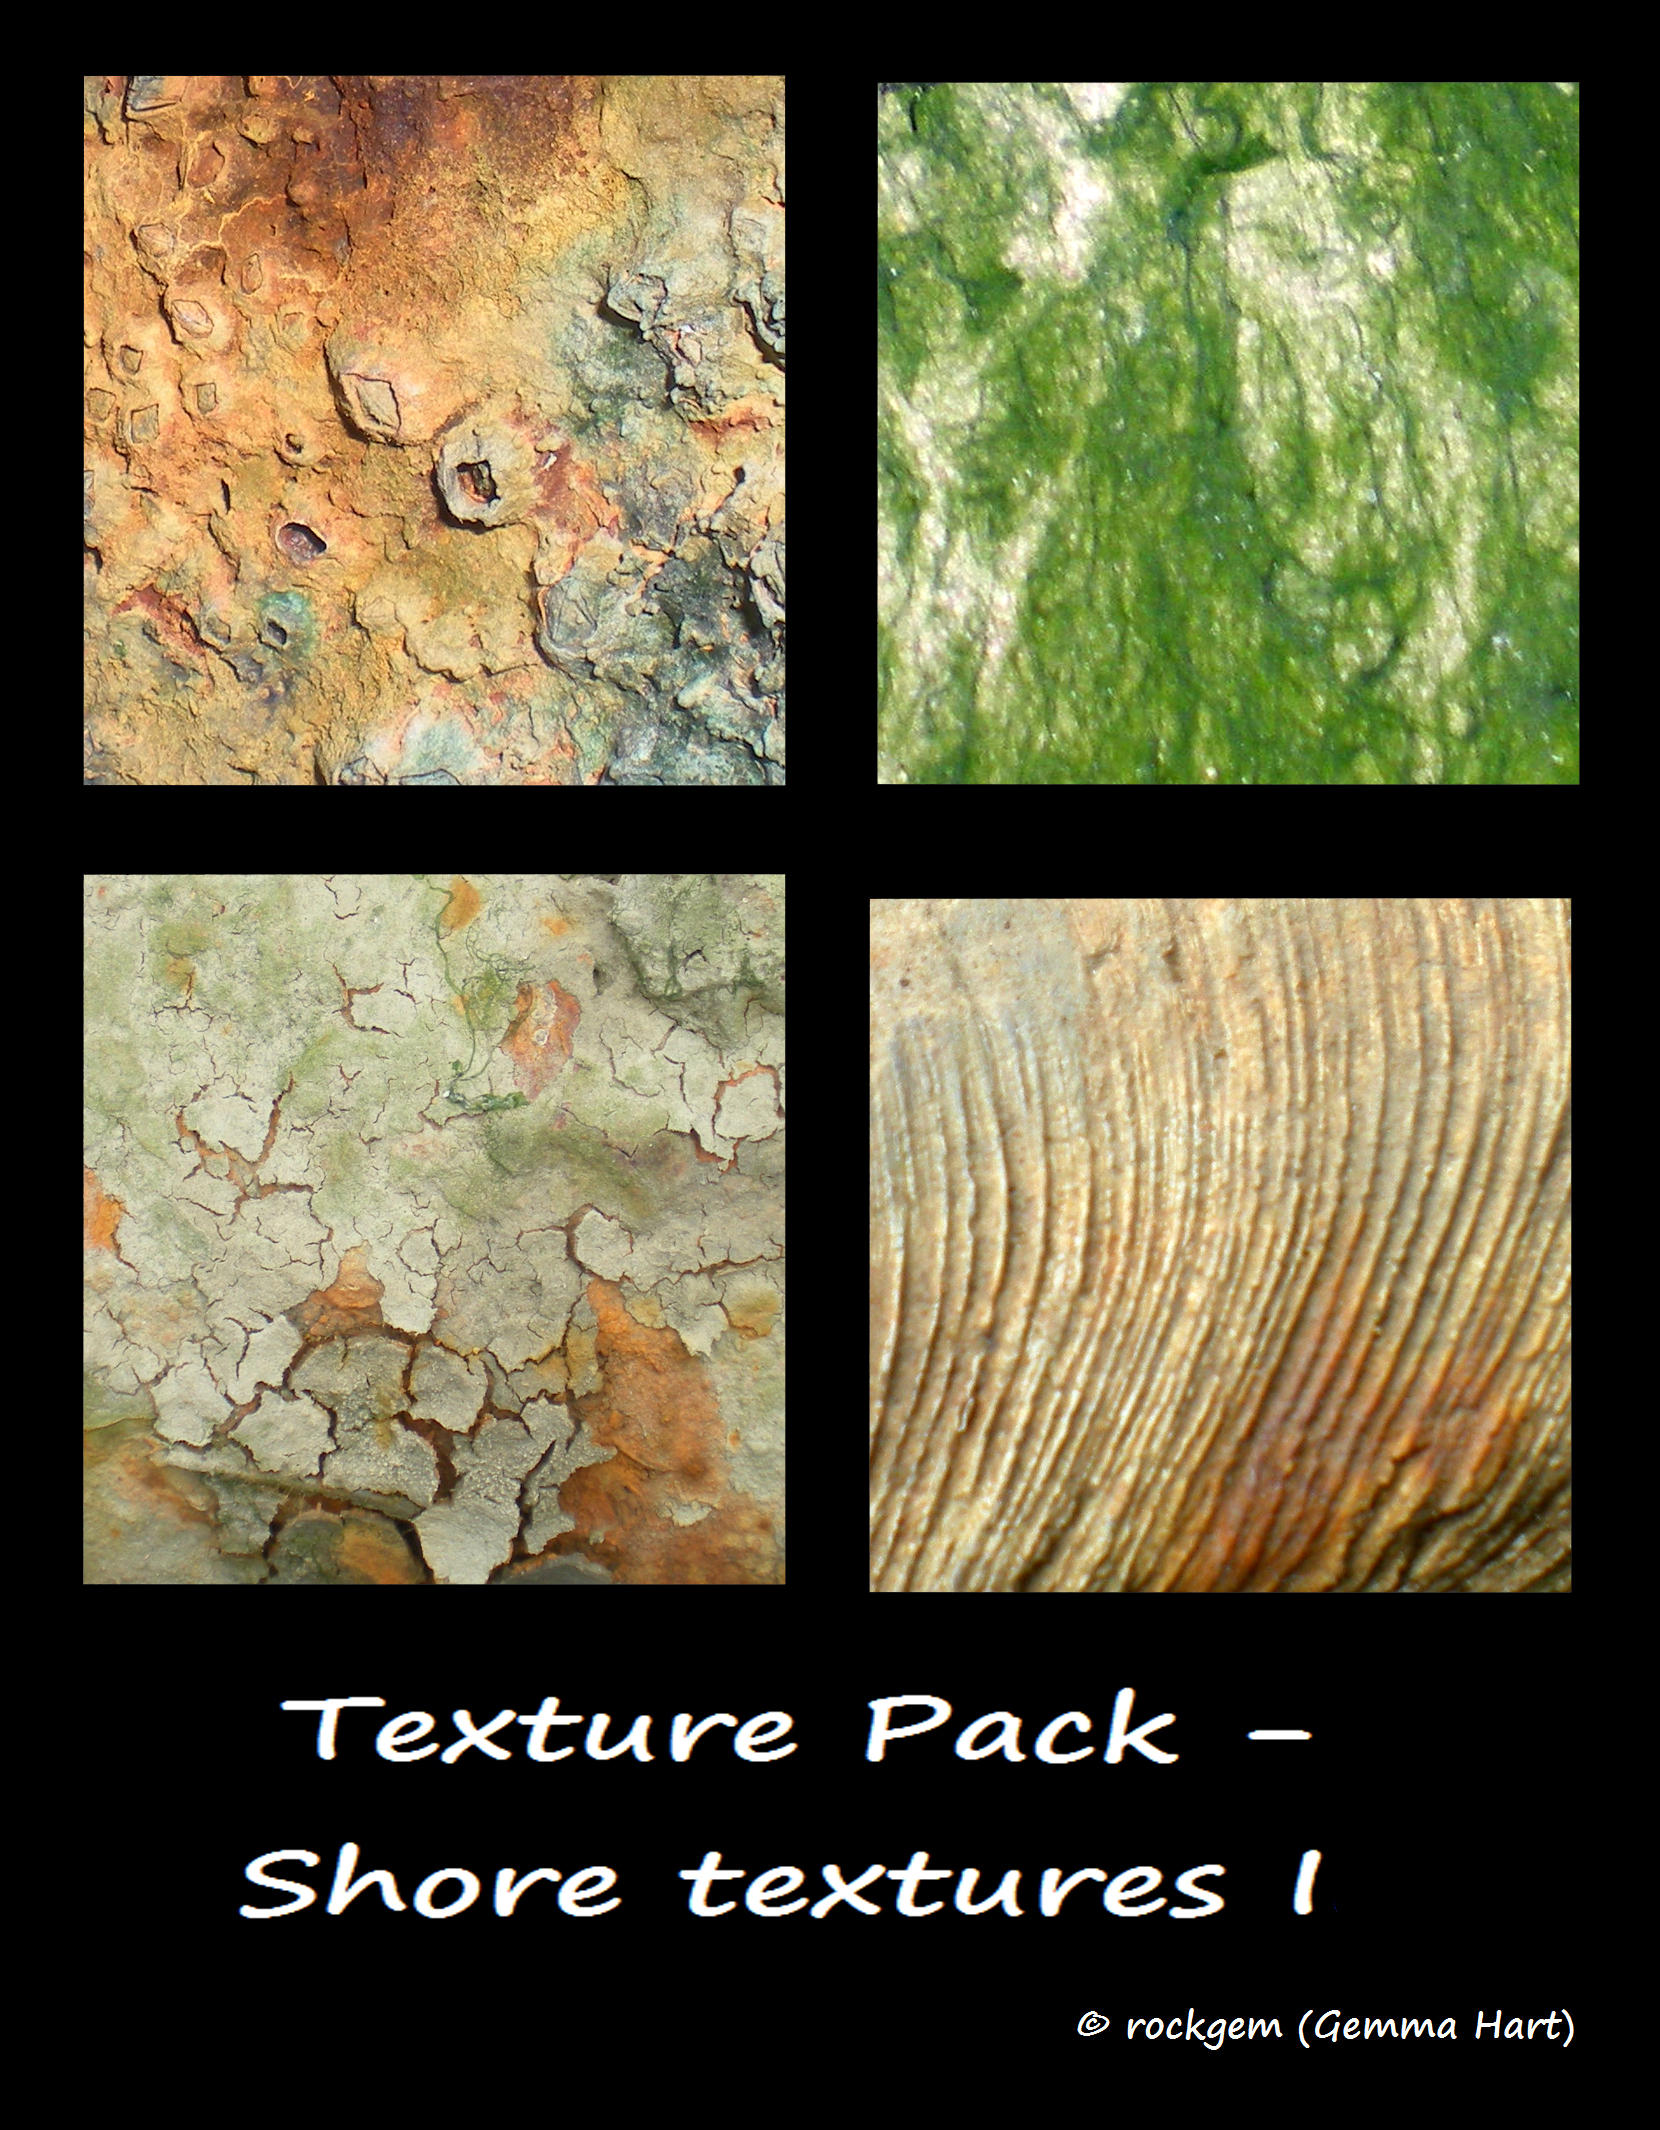 Texture Pack - Shore textures I by rockgem